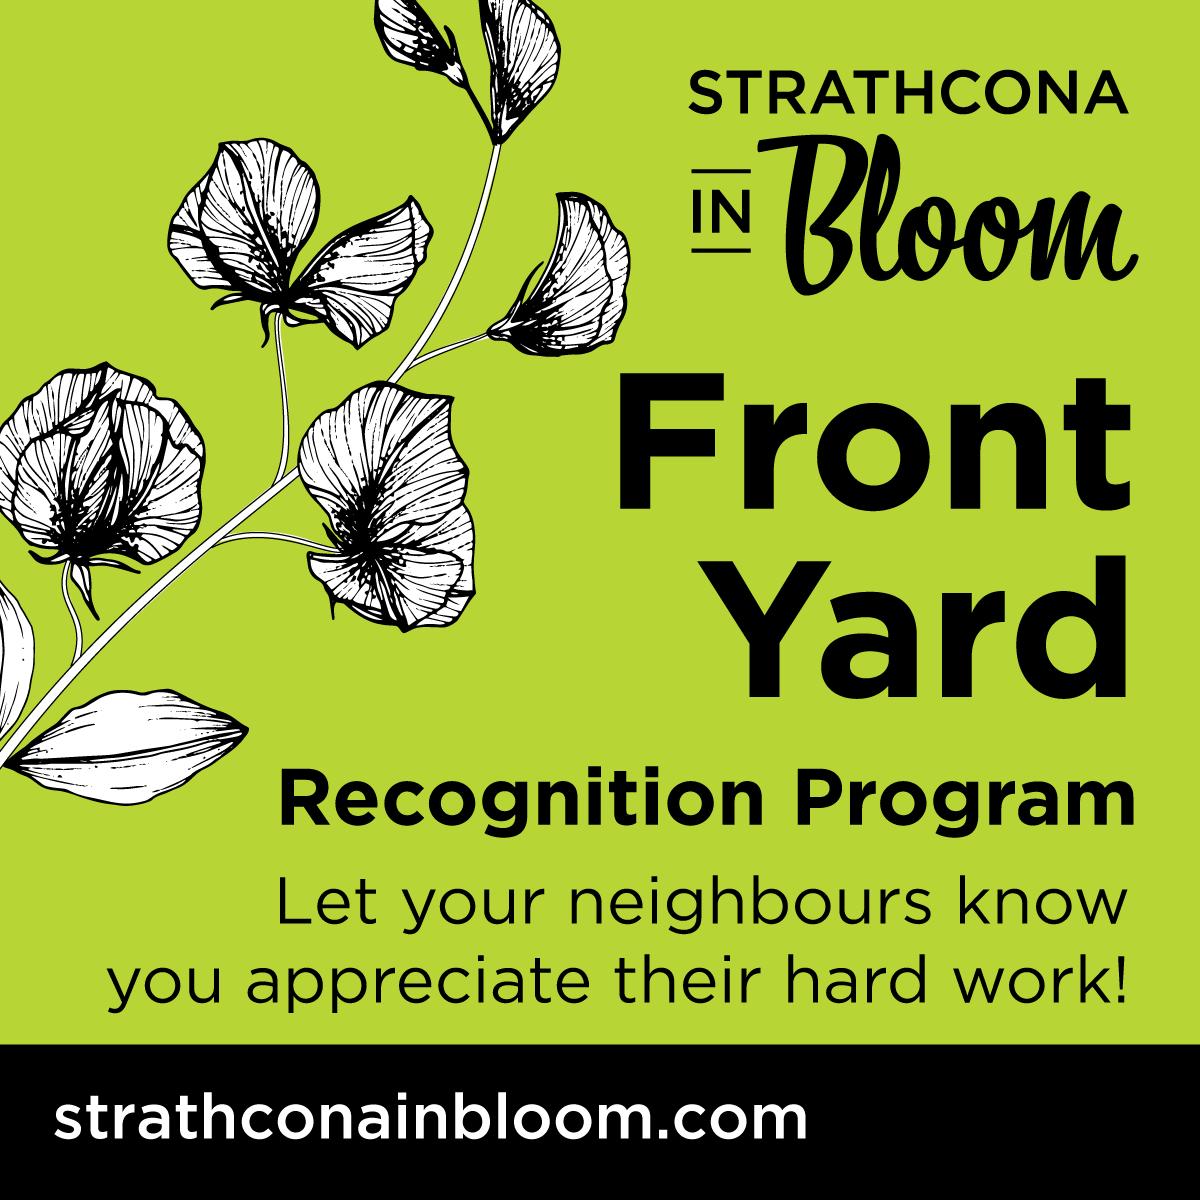 FB image Front Yard 2020